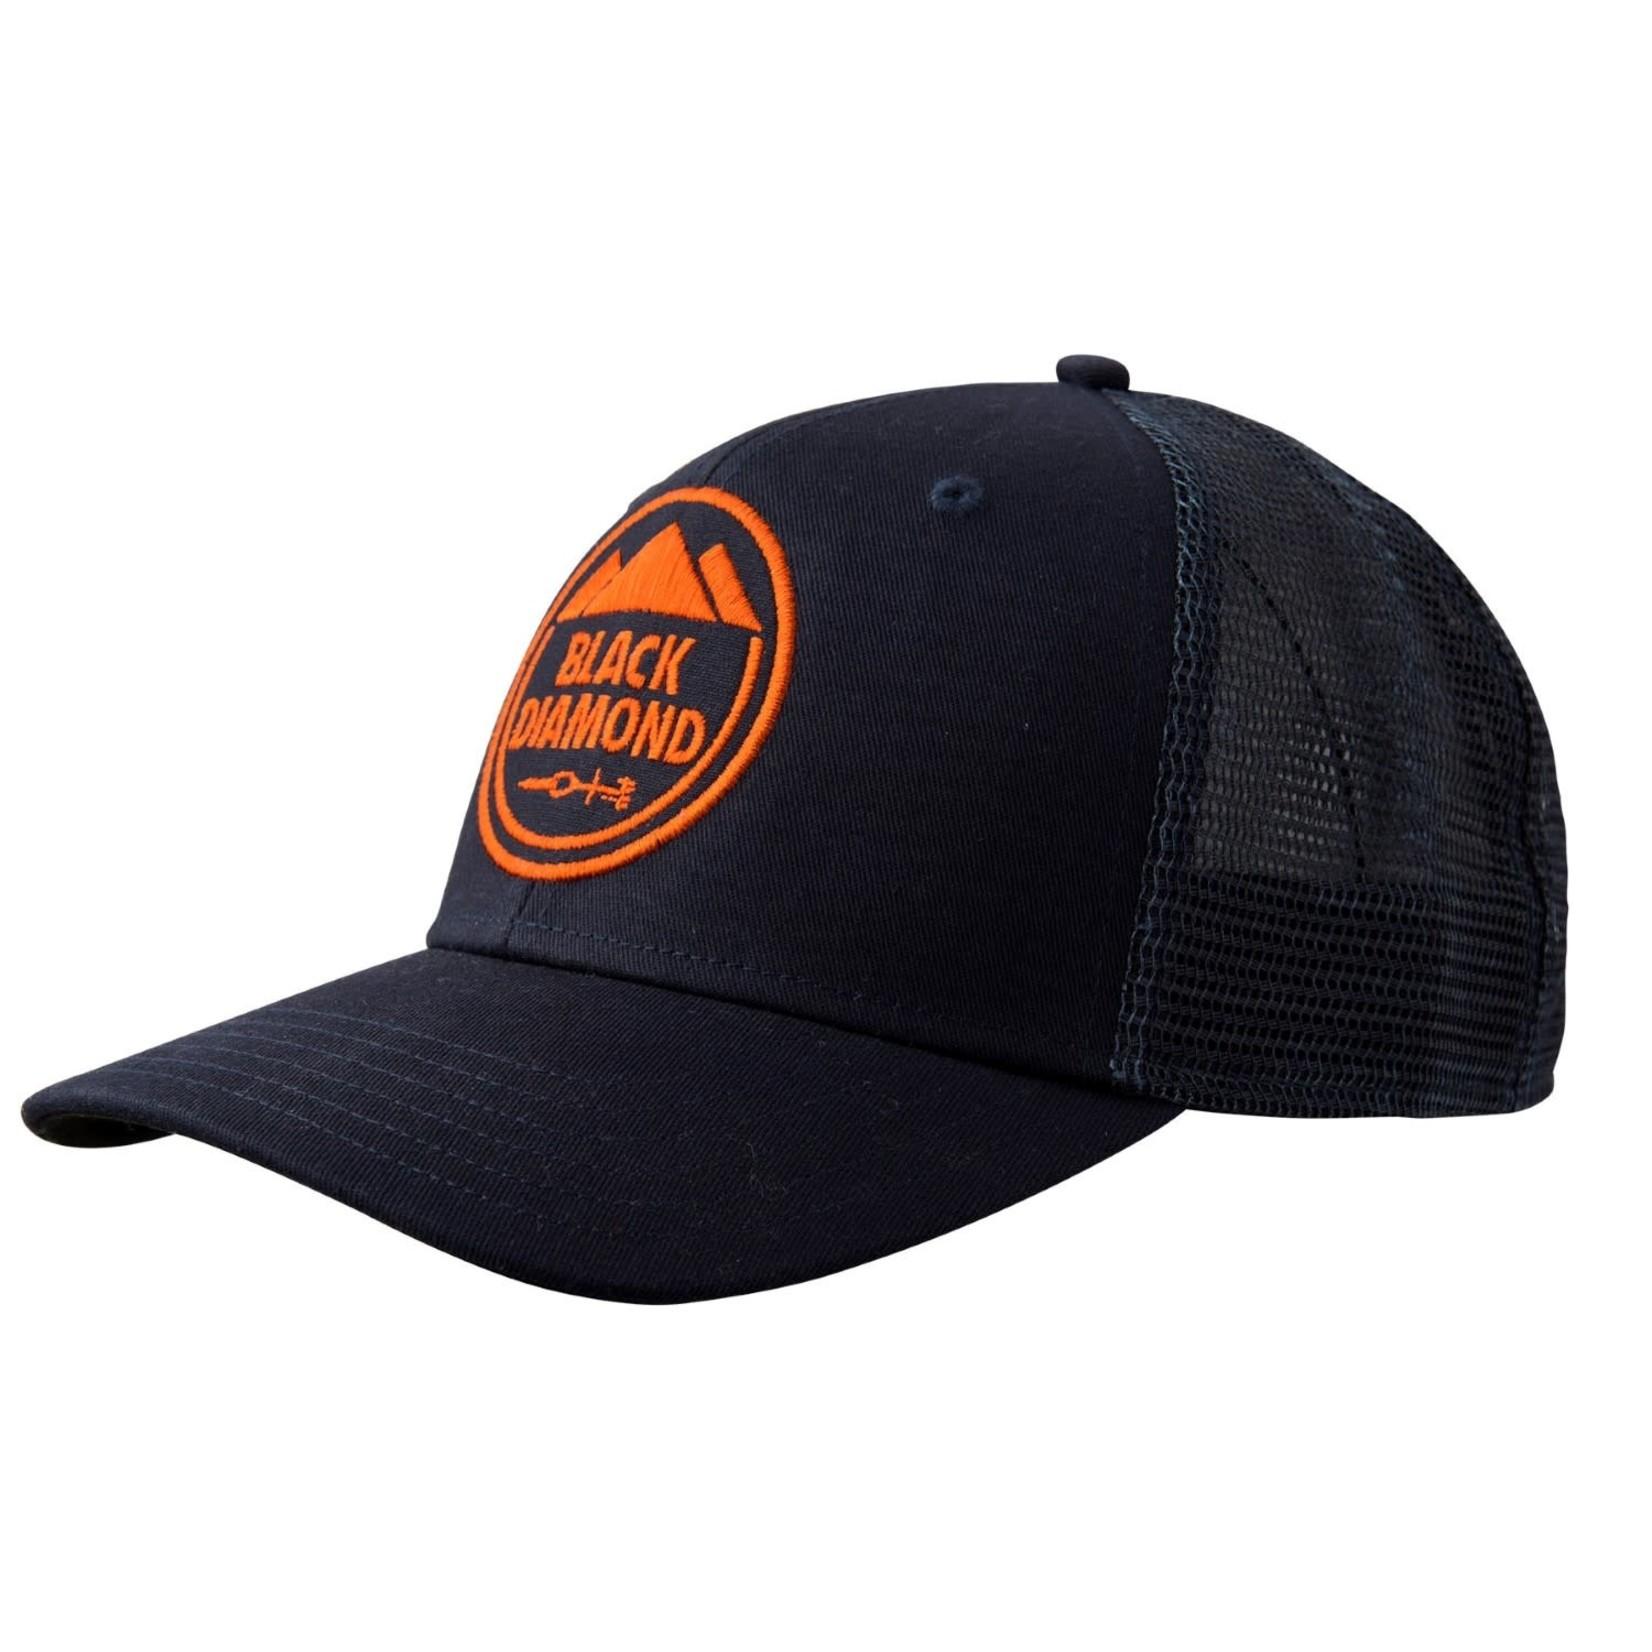 Black Diamond Black Diamond Trucker Hat - Homme